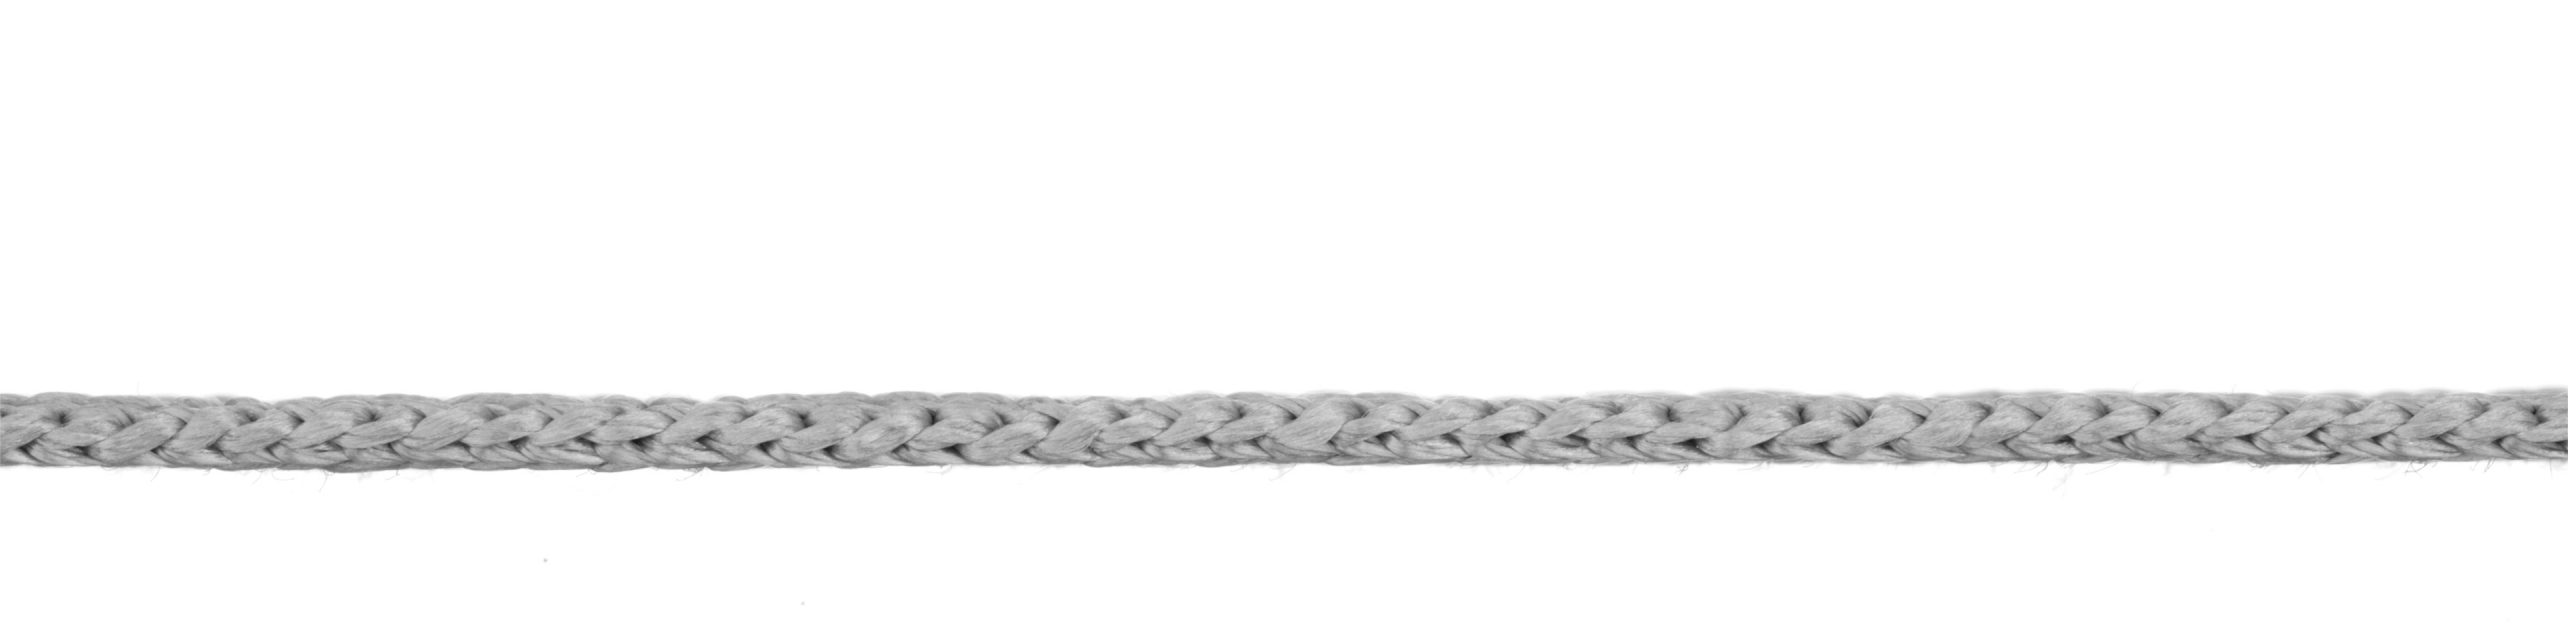 StringKing Type 3 Performance Lacrosse Mesh Material String